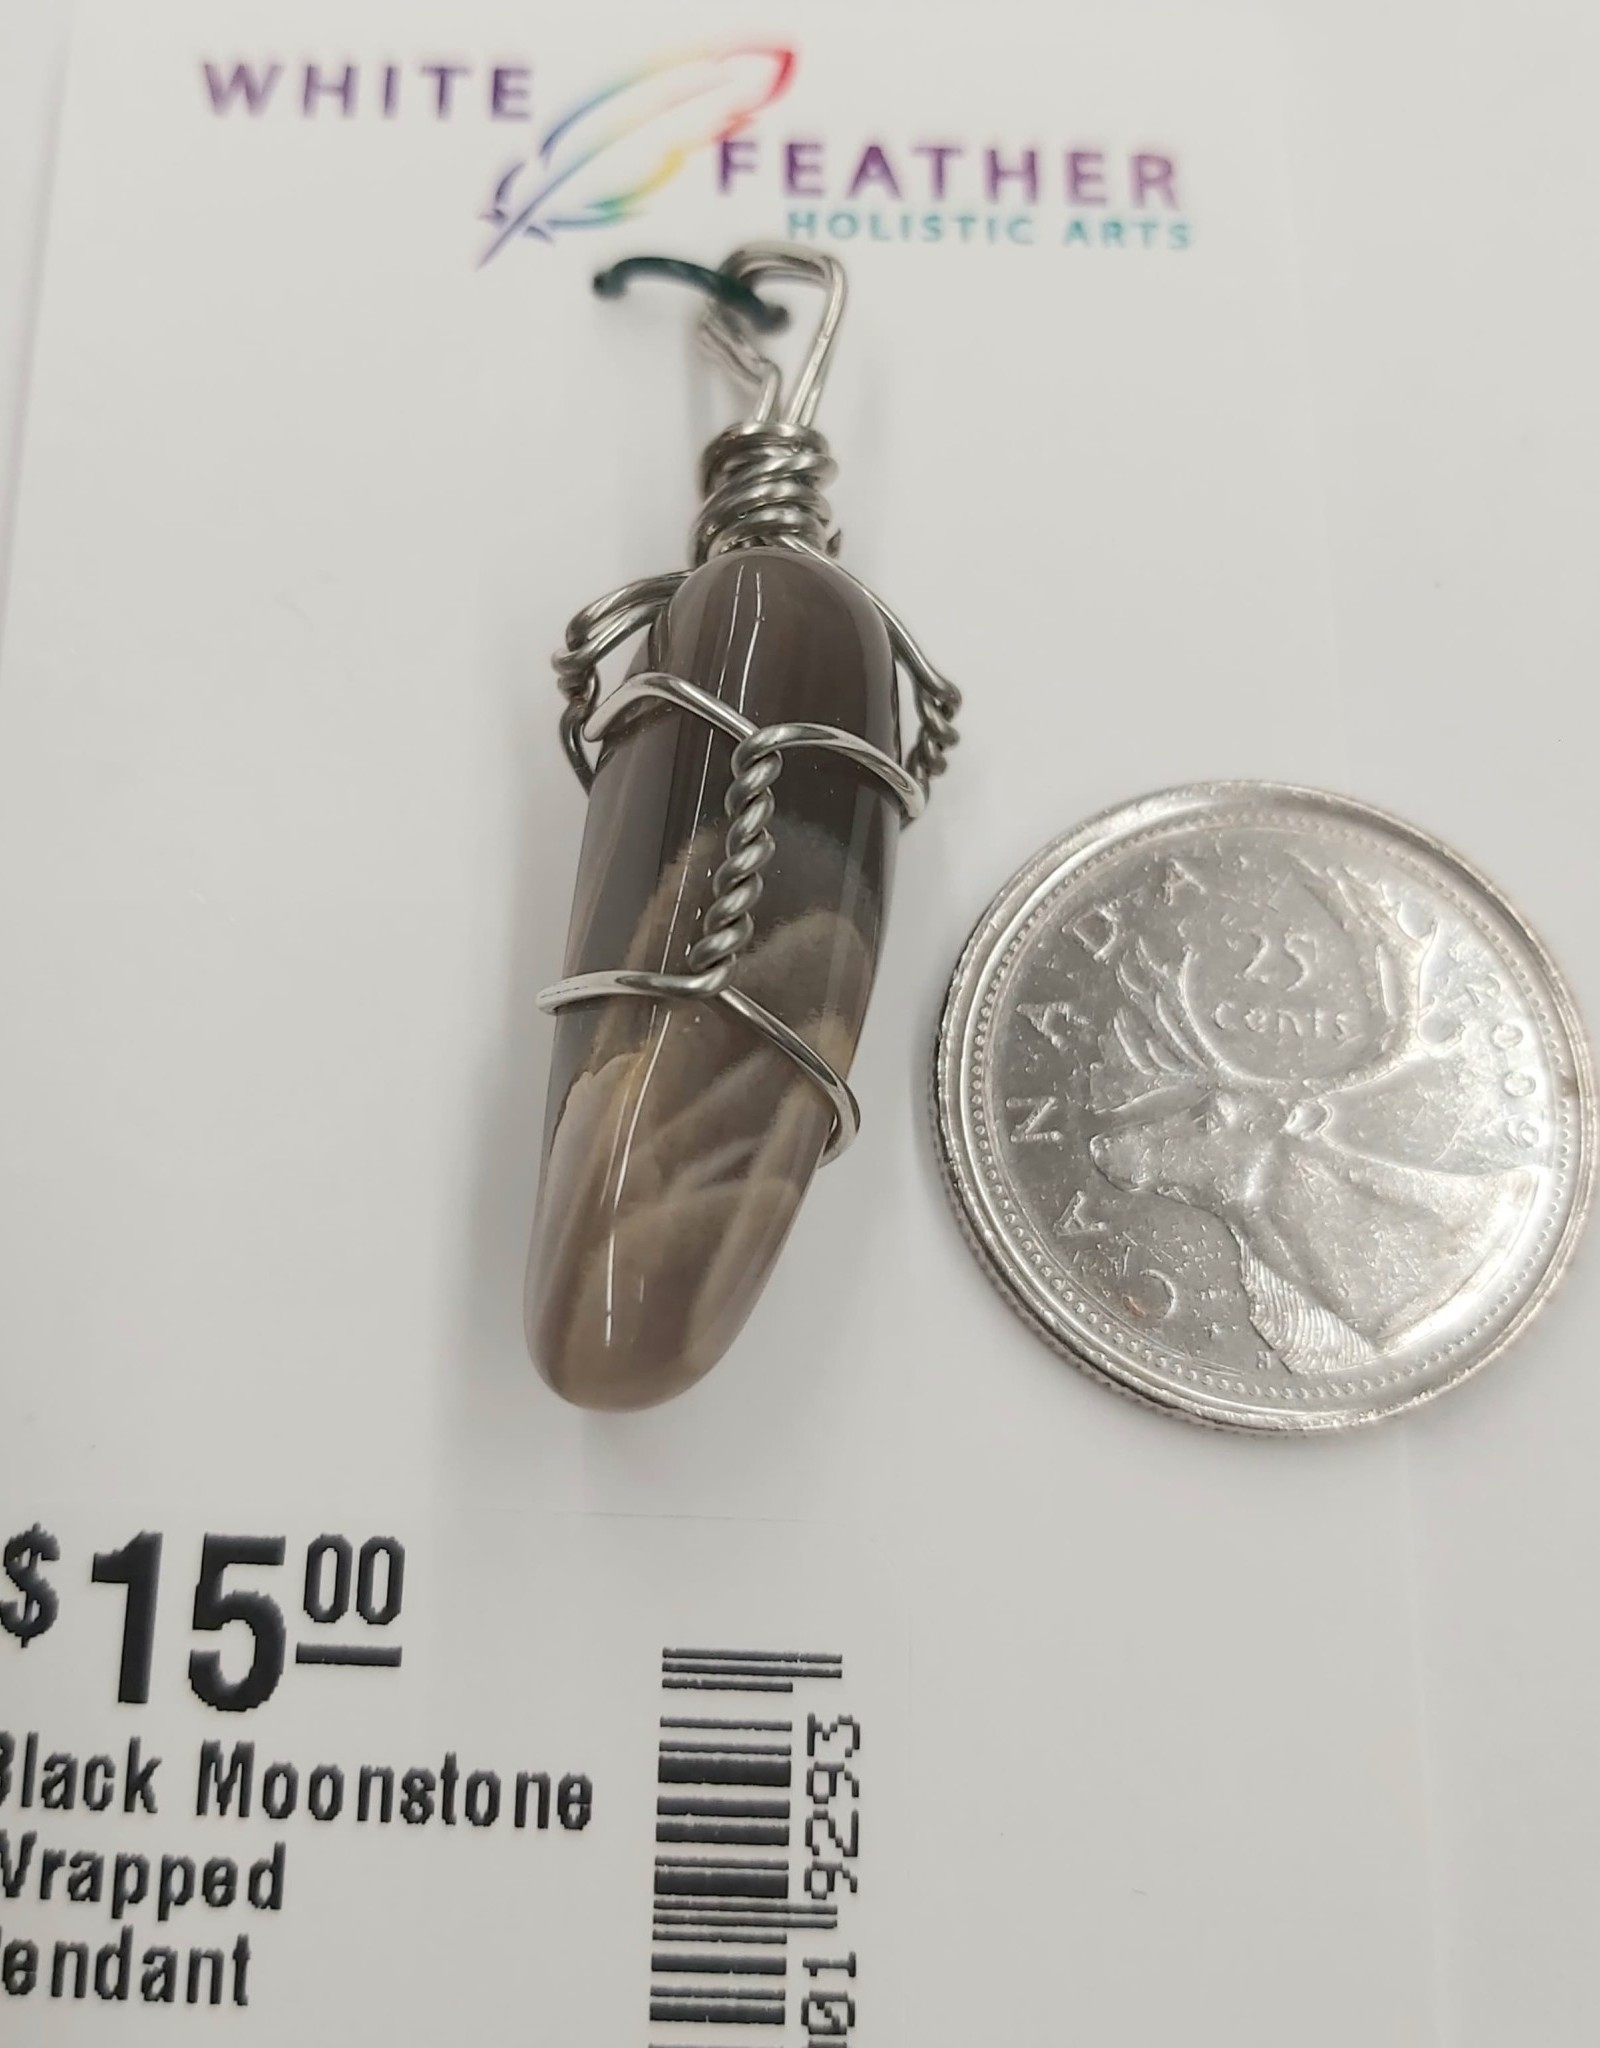 Black Moonstone Wrapped Pendant